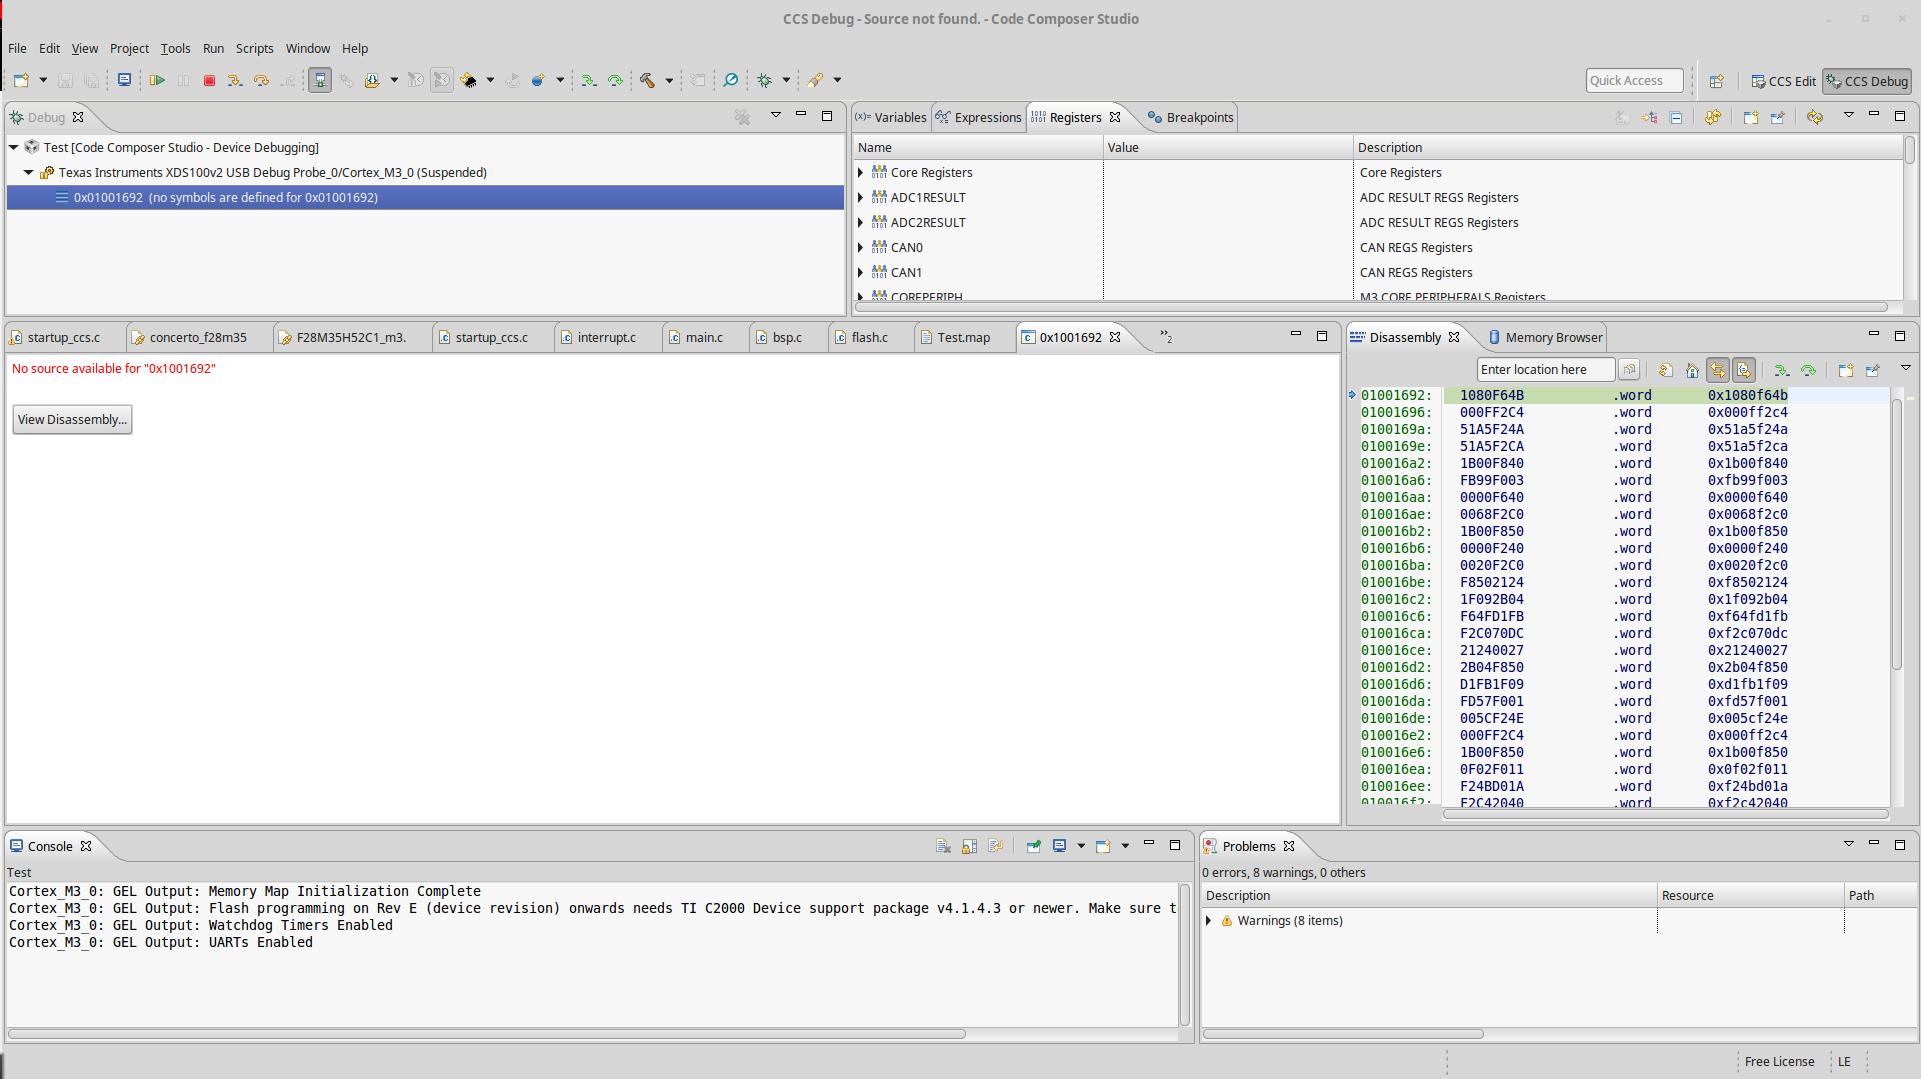 Resolved] CCS/F28M35H52C: Concerto GNU compiler support for